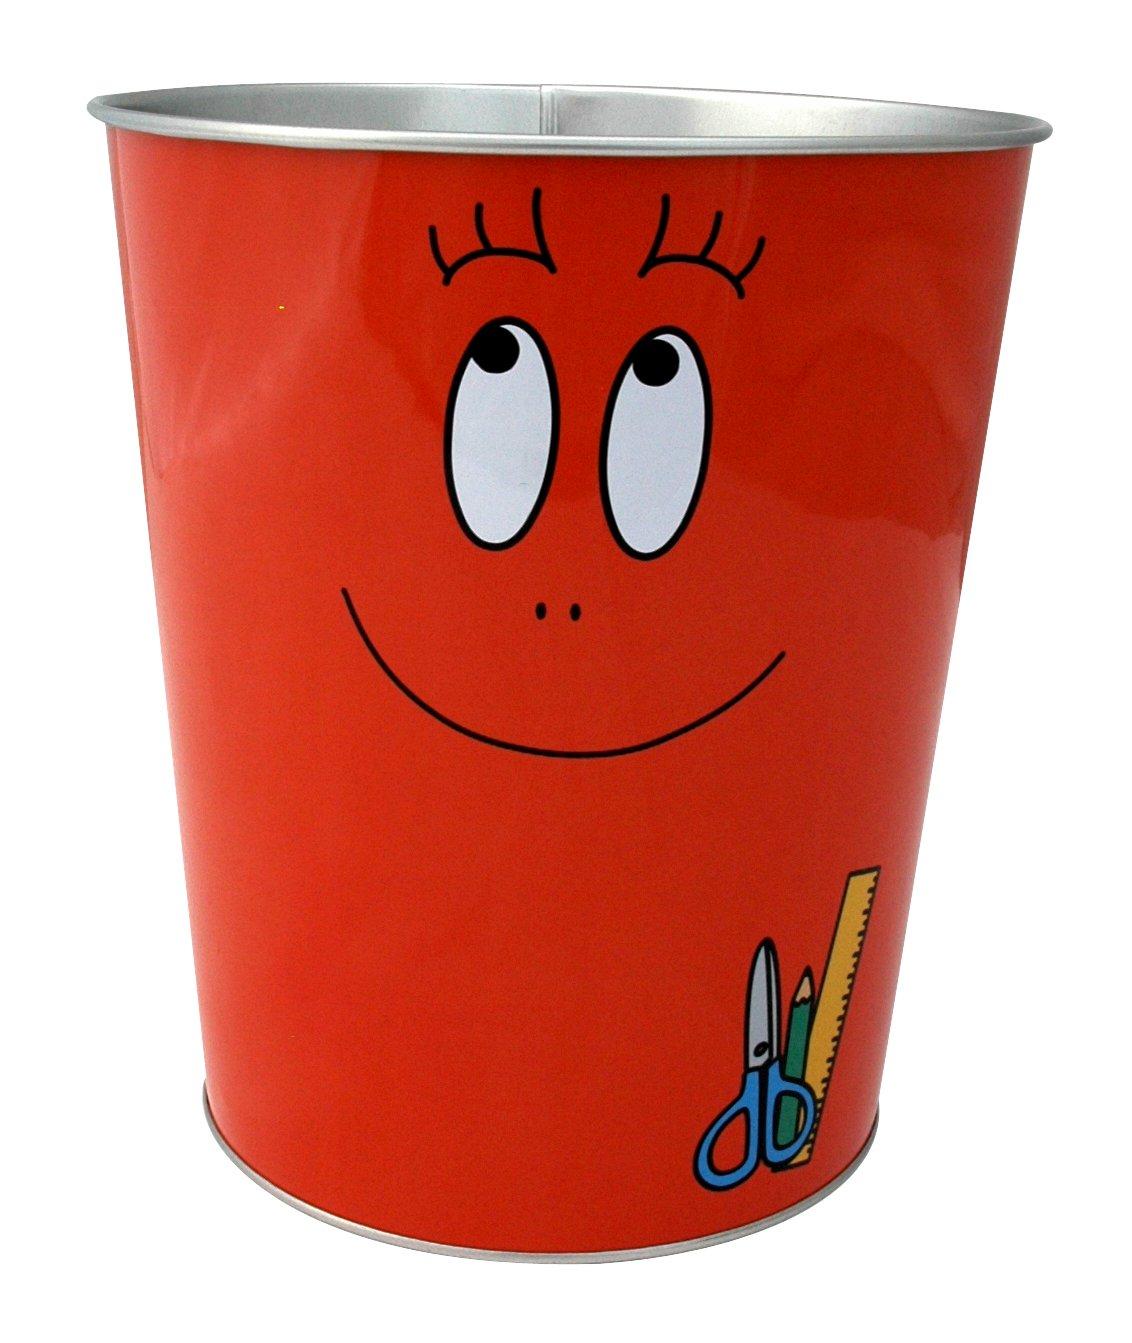 Barbapapa – Retro Blech Papierkorb – Barbawum Rot günstig bestellen